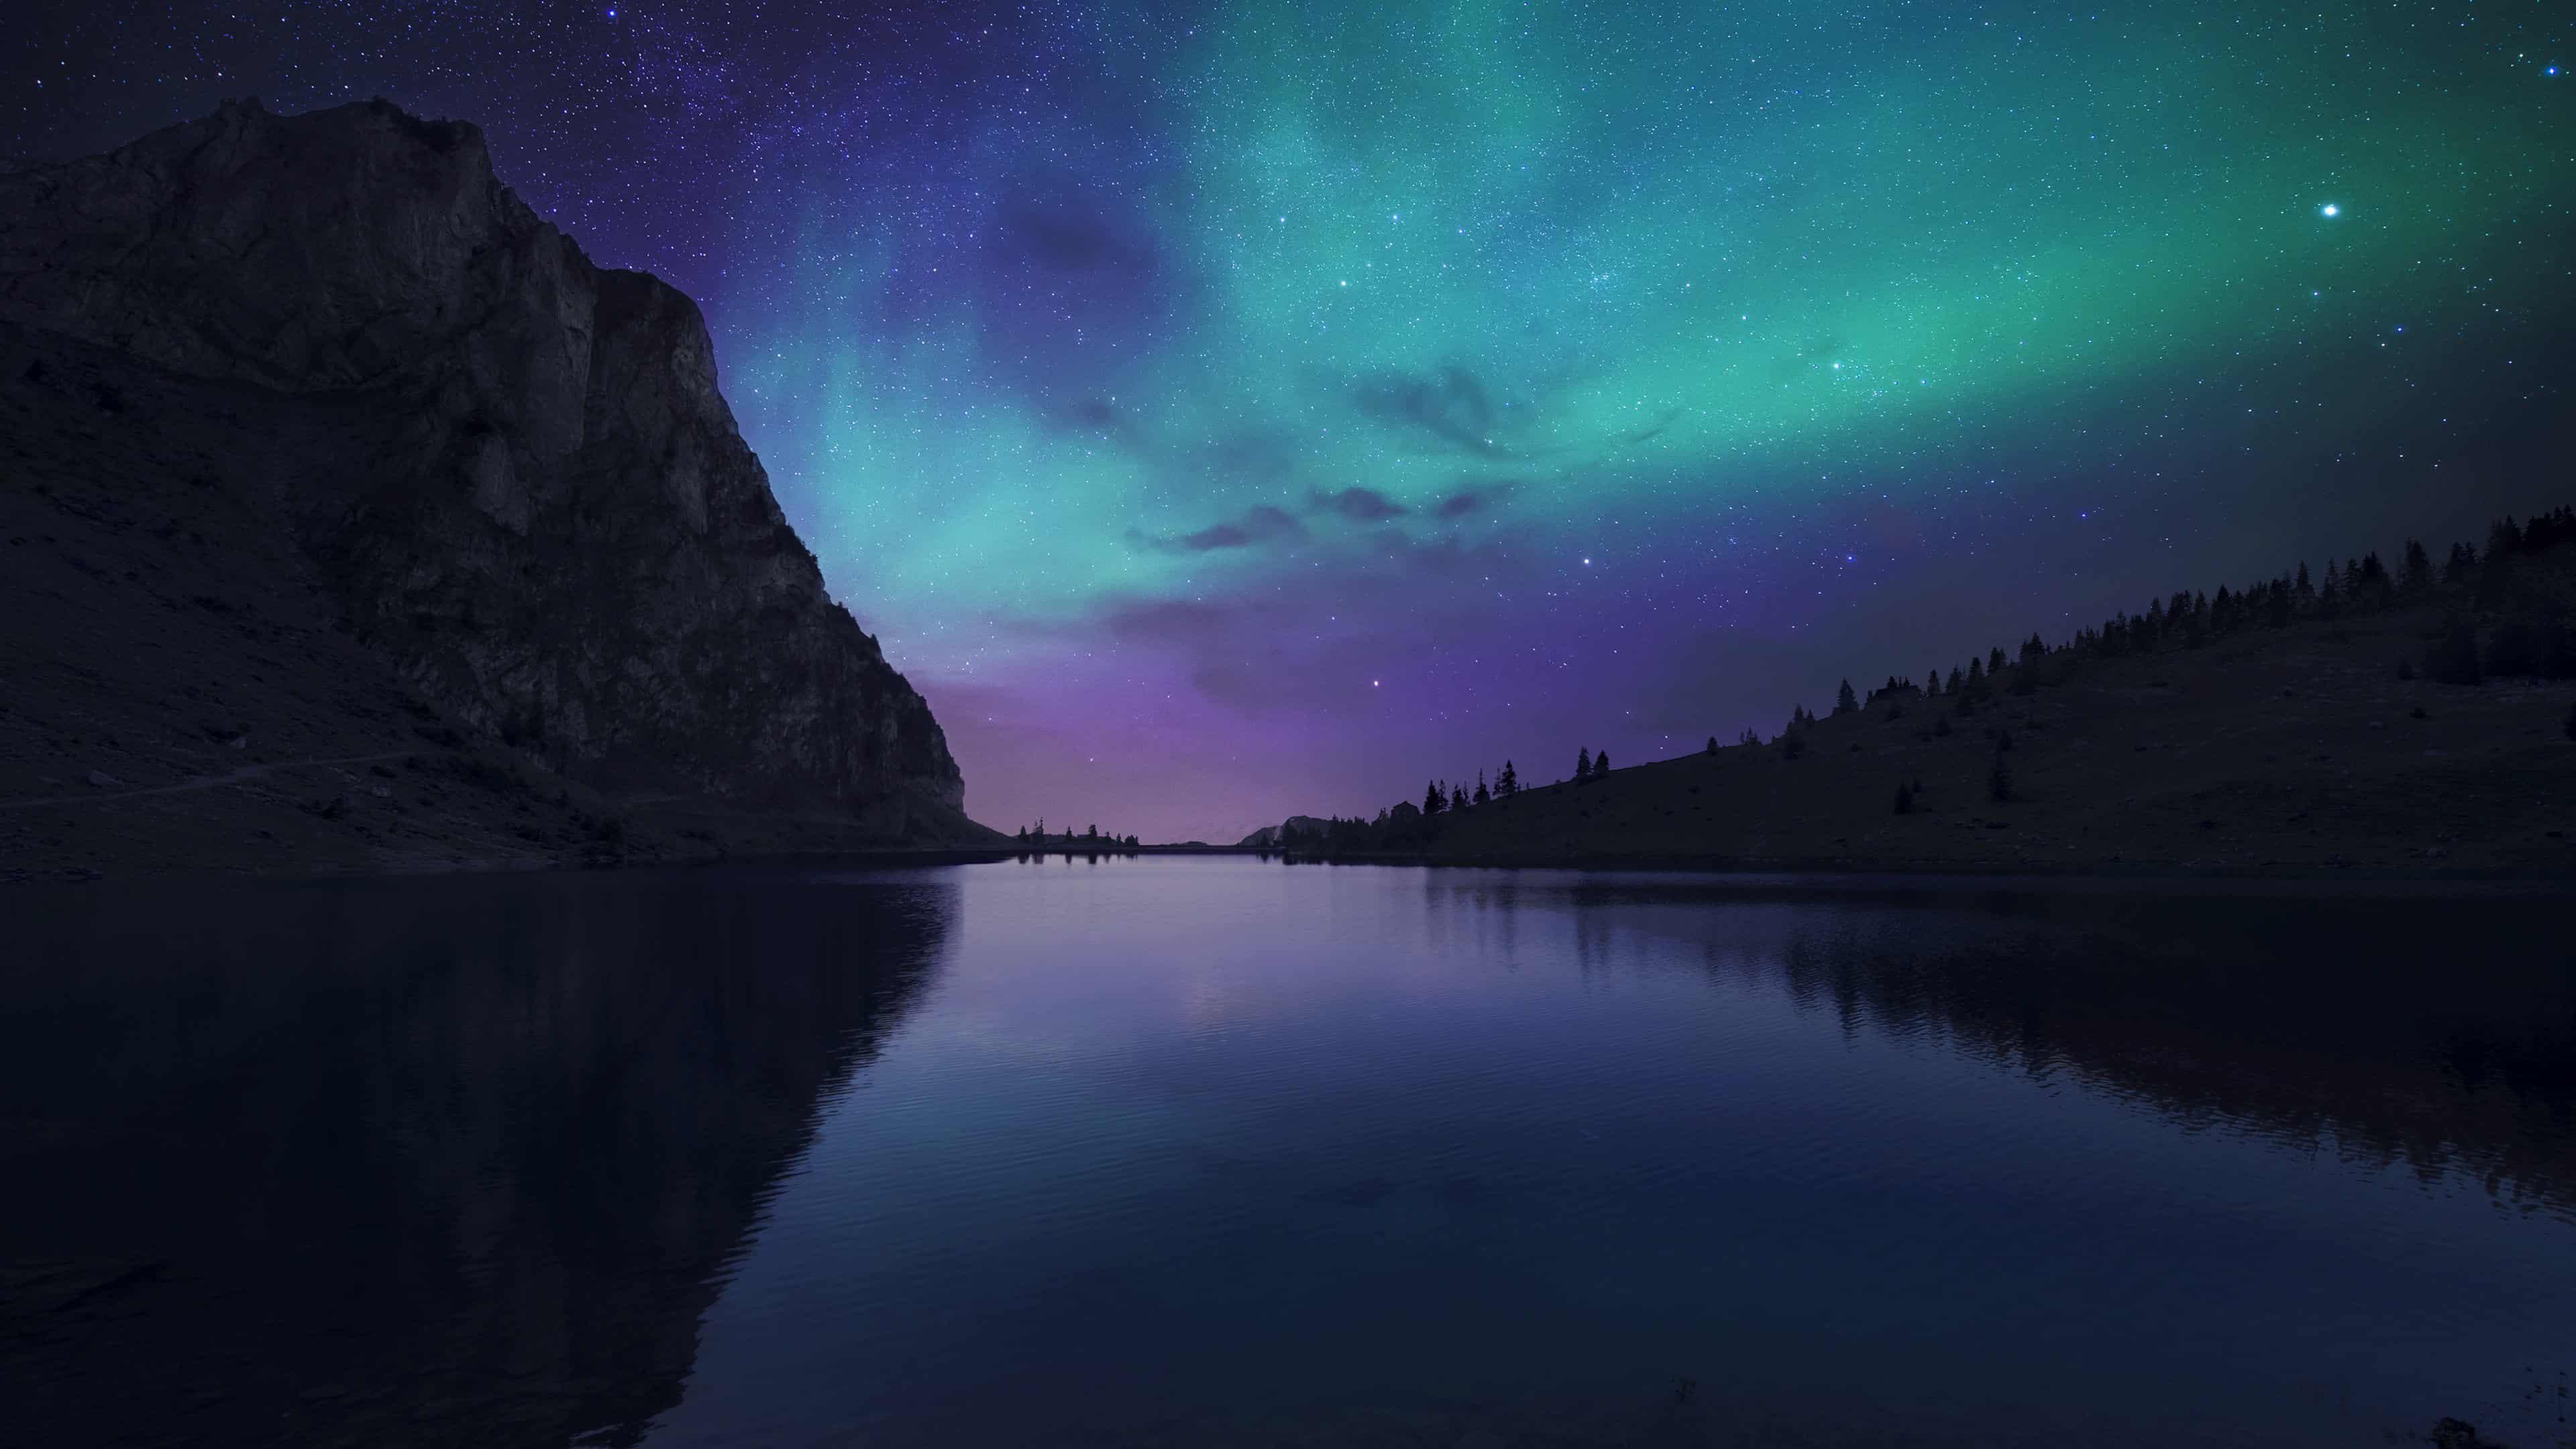 northern lights aurora borealis over lake uhd 4k wallpaper